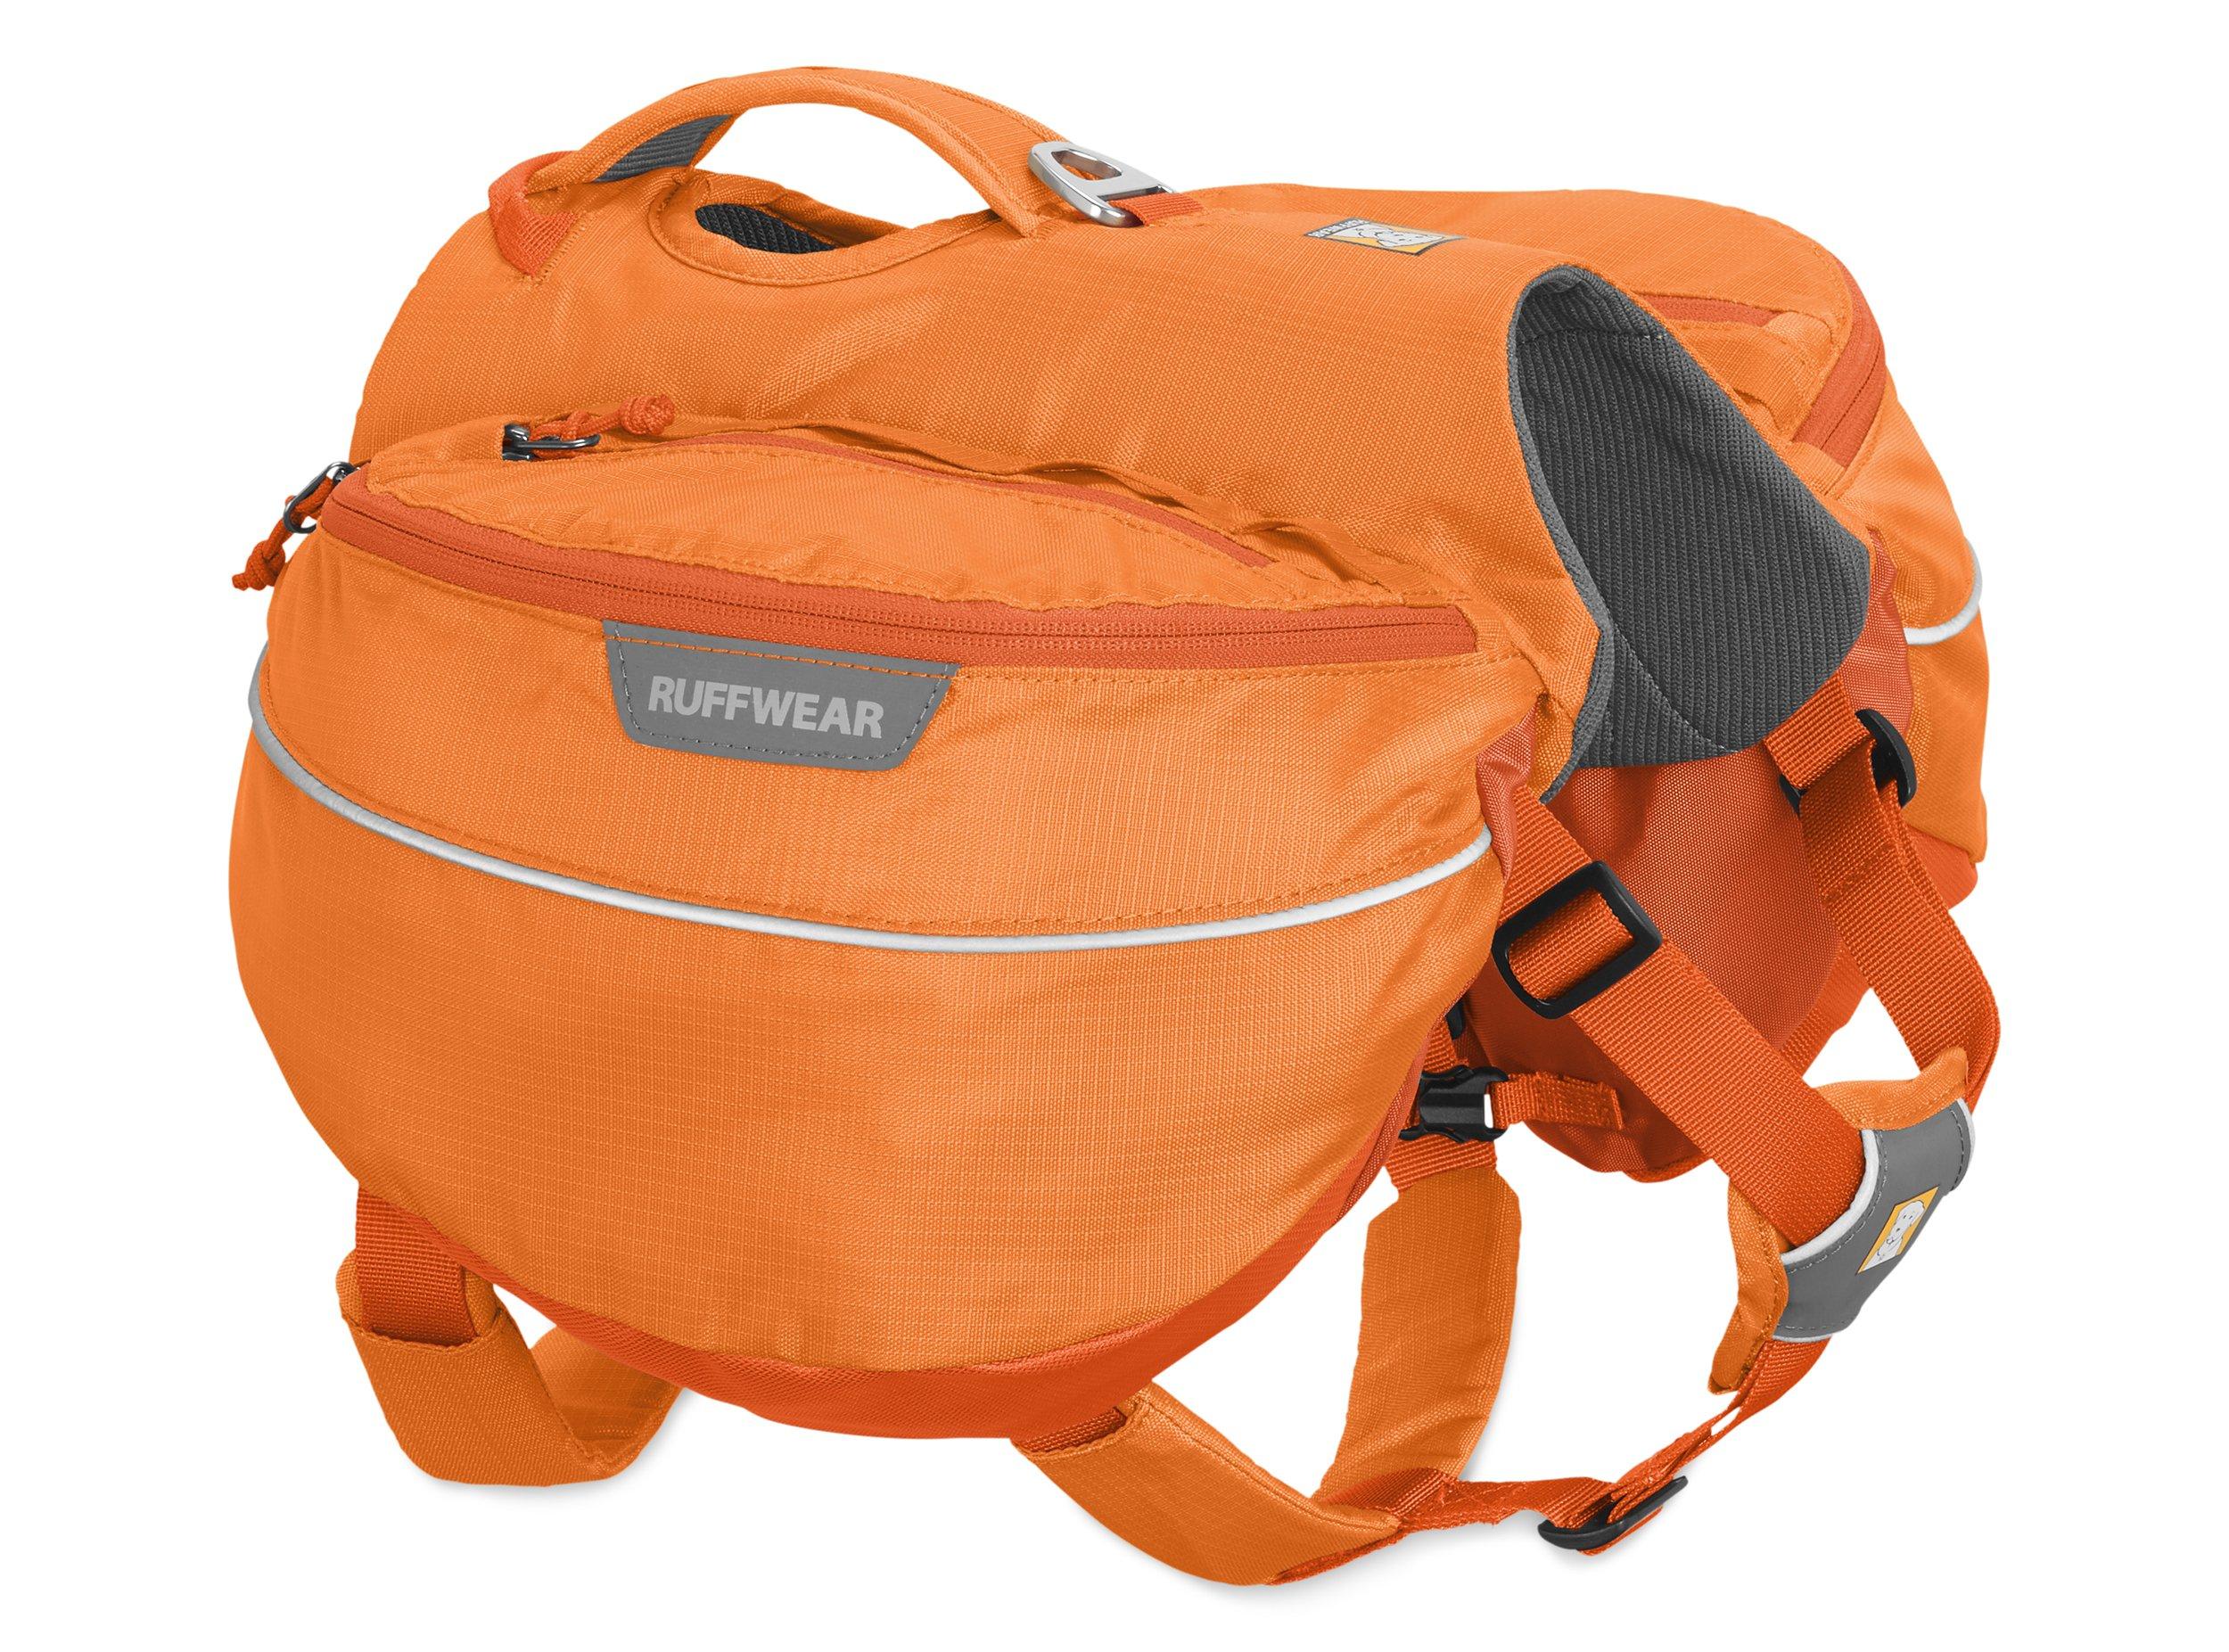 Ruffwear - Aira Hiking Pack for Dogs, Orange Poppy (2017), Large/X-Large